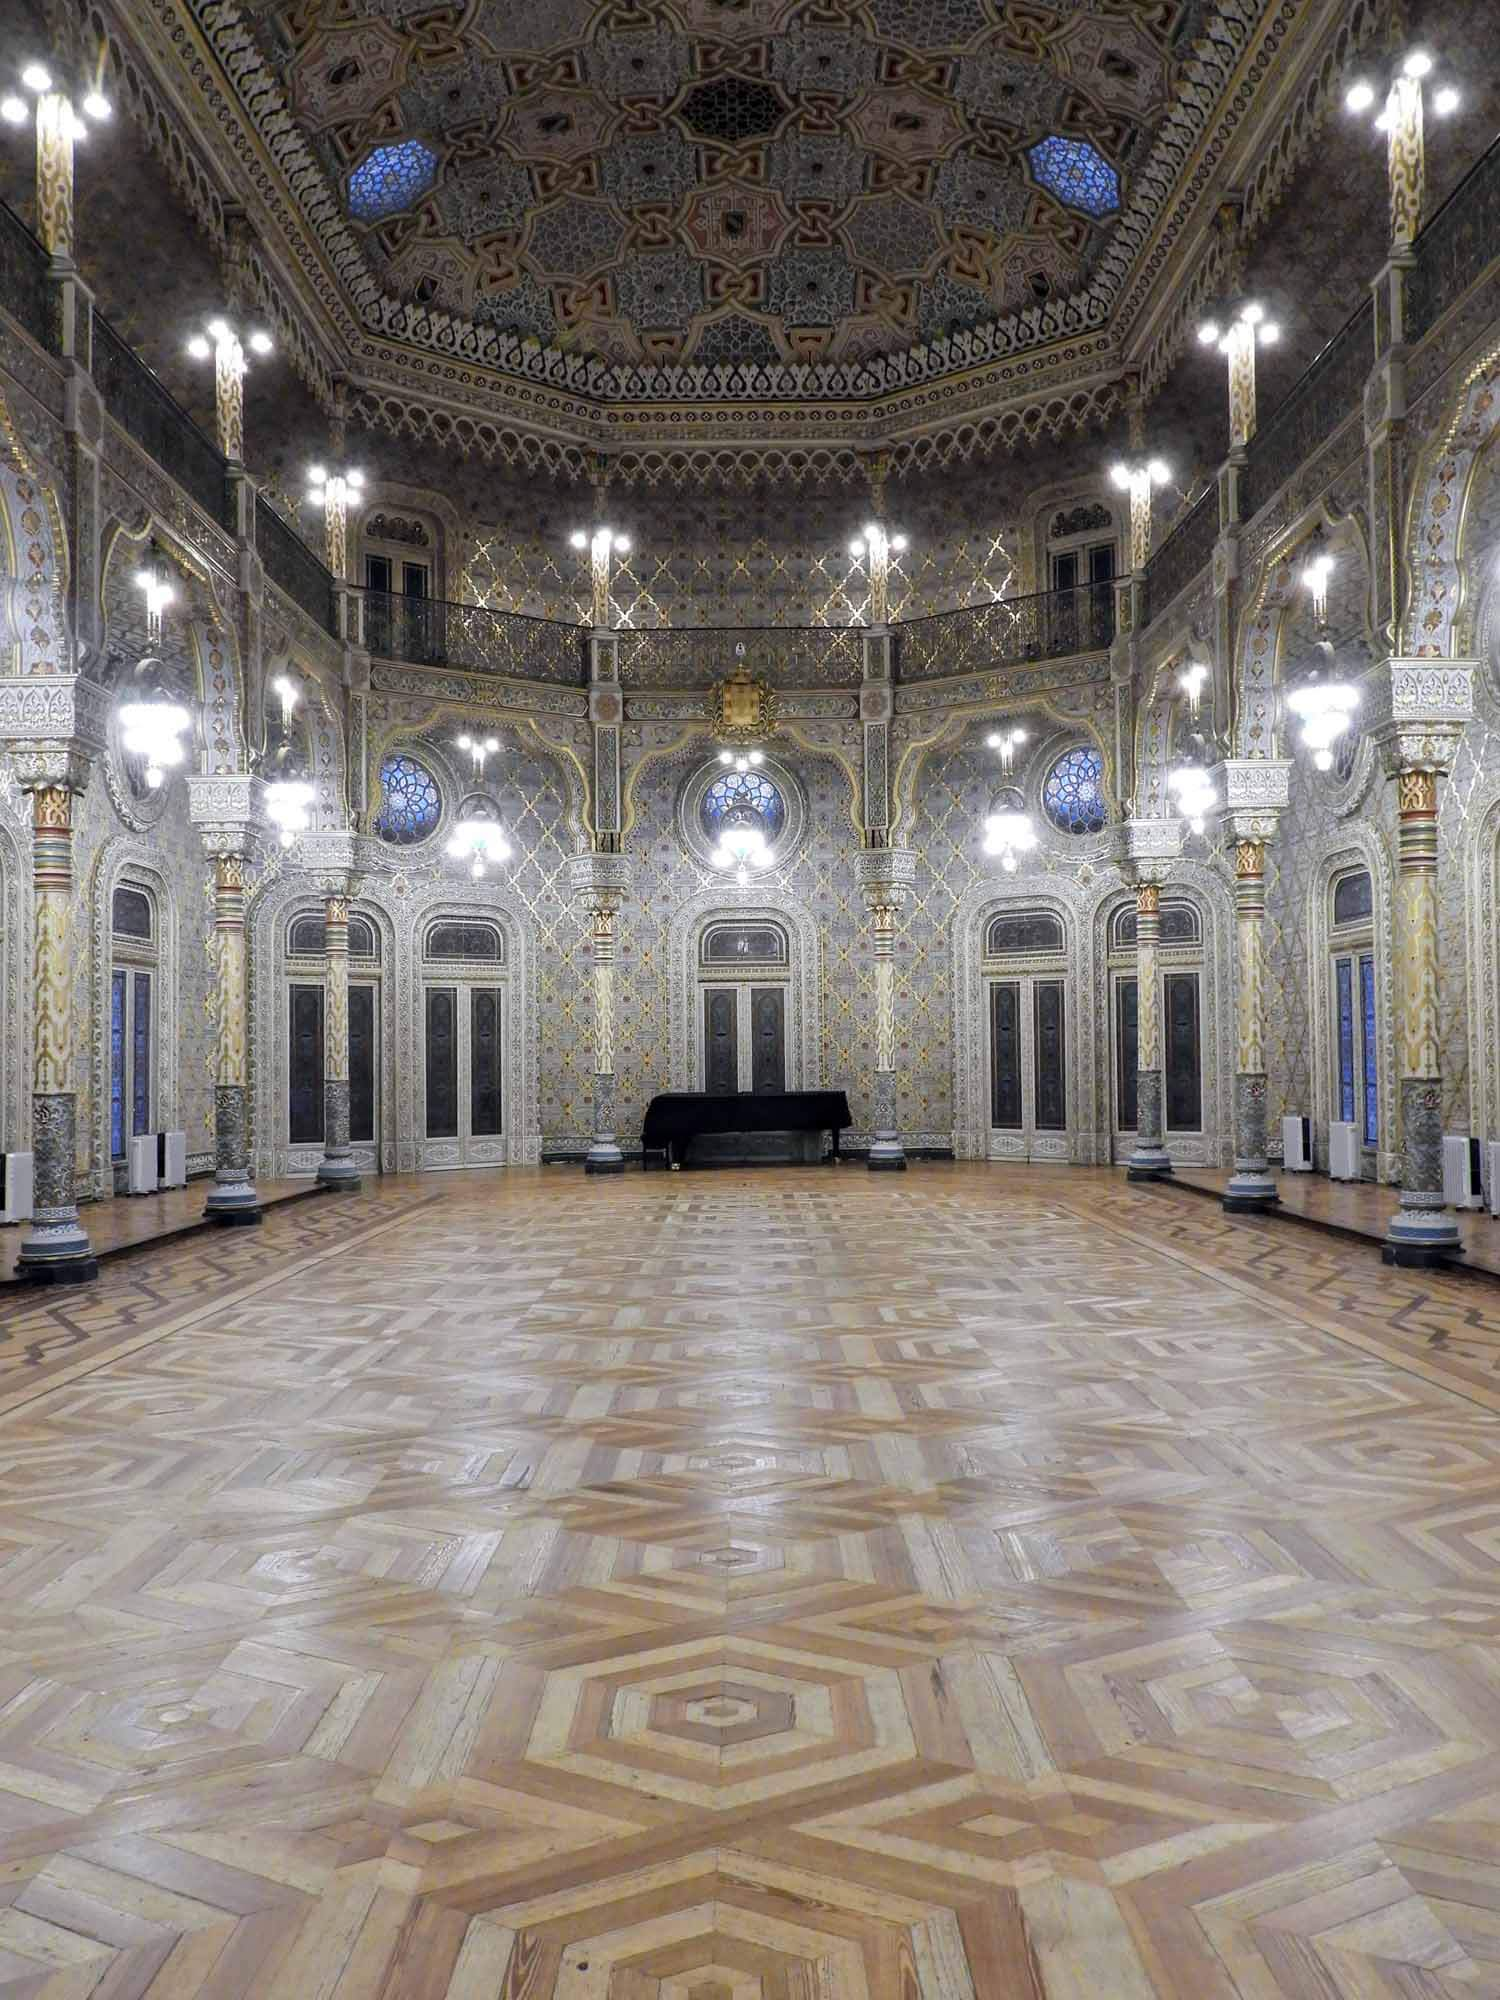 portugal-porto-oporto-museum-palacio-da-bolsa-arab-moorish-rivival-room-vertical.jpg